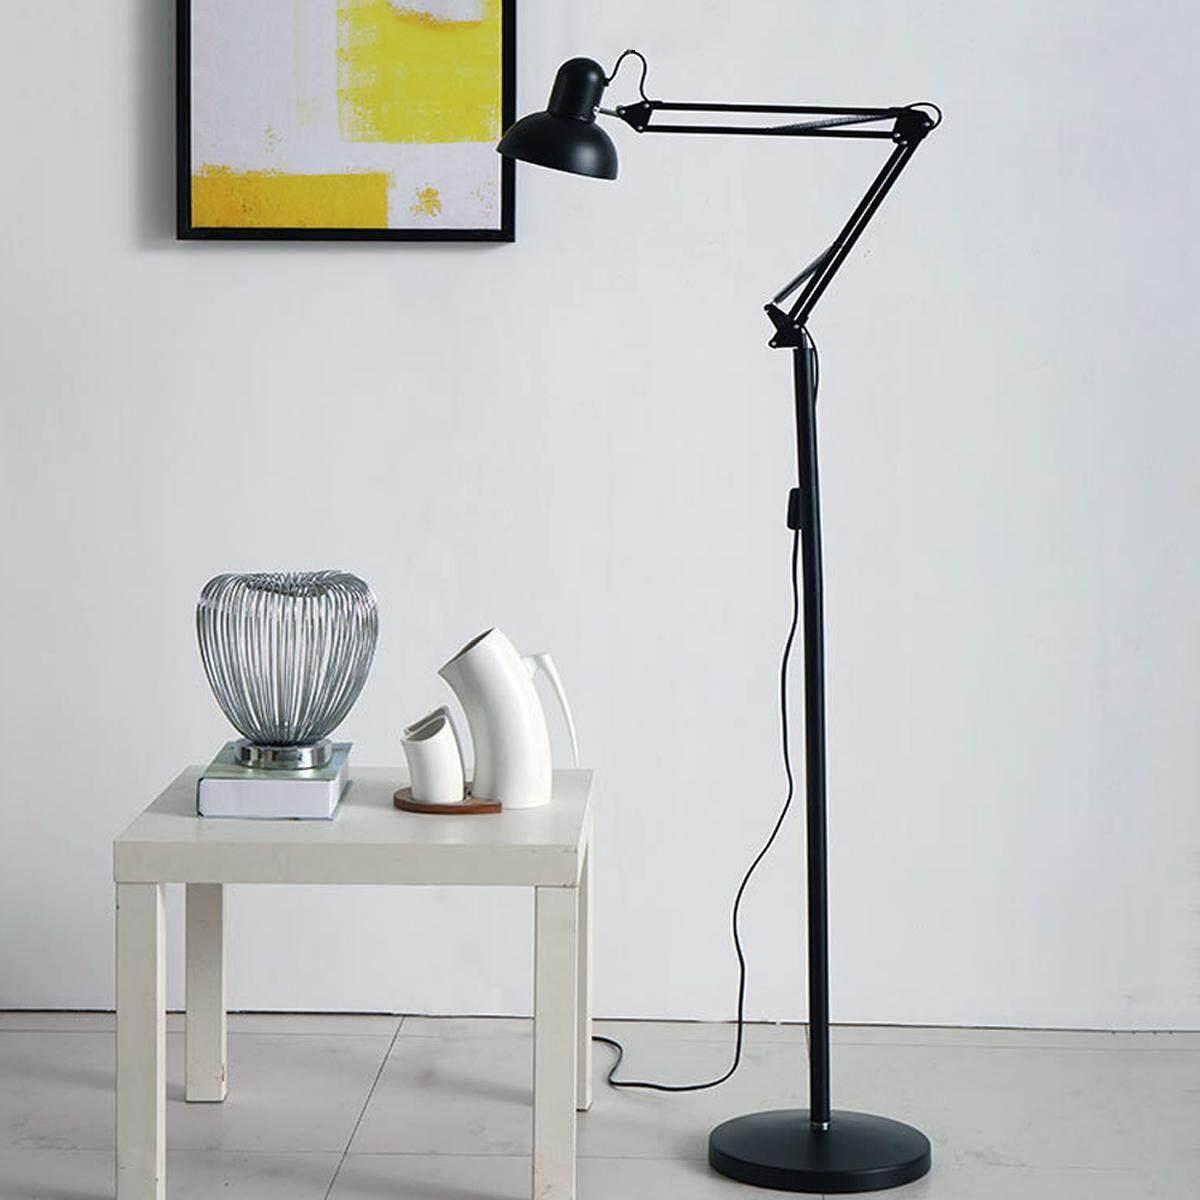 Pandas Home โคมตั้งพื้นพับเก็บได้ Adjustable Floor Lamp By Pandas Home.